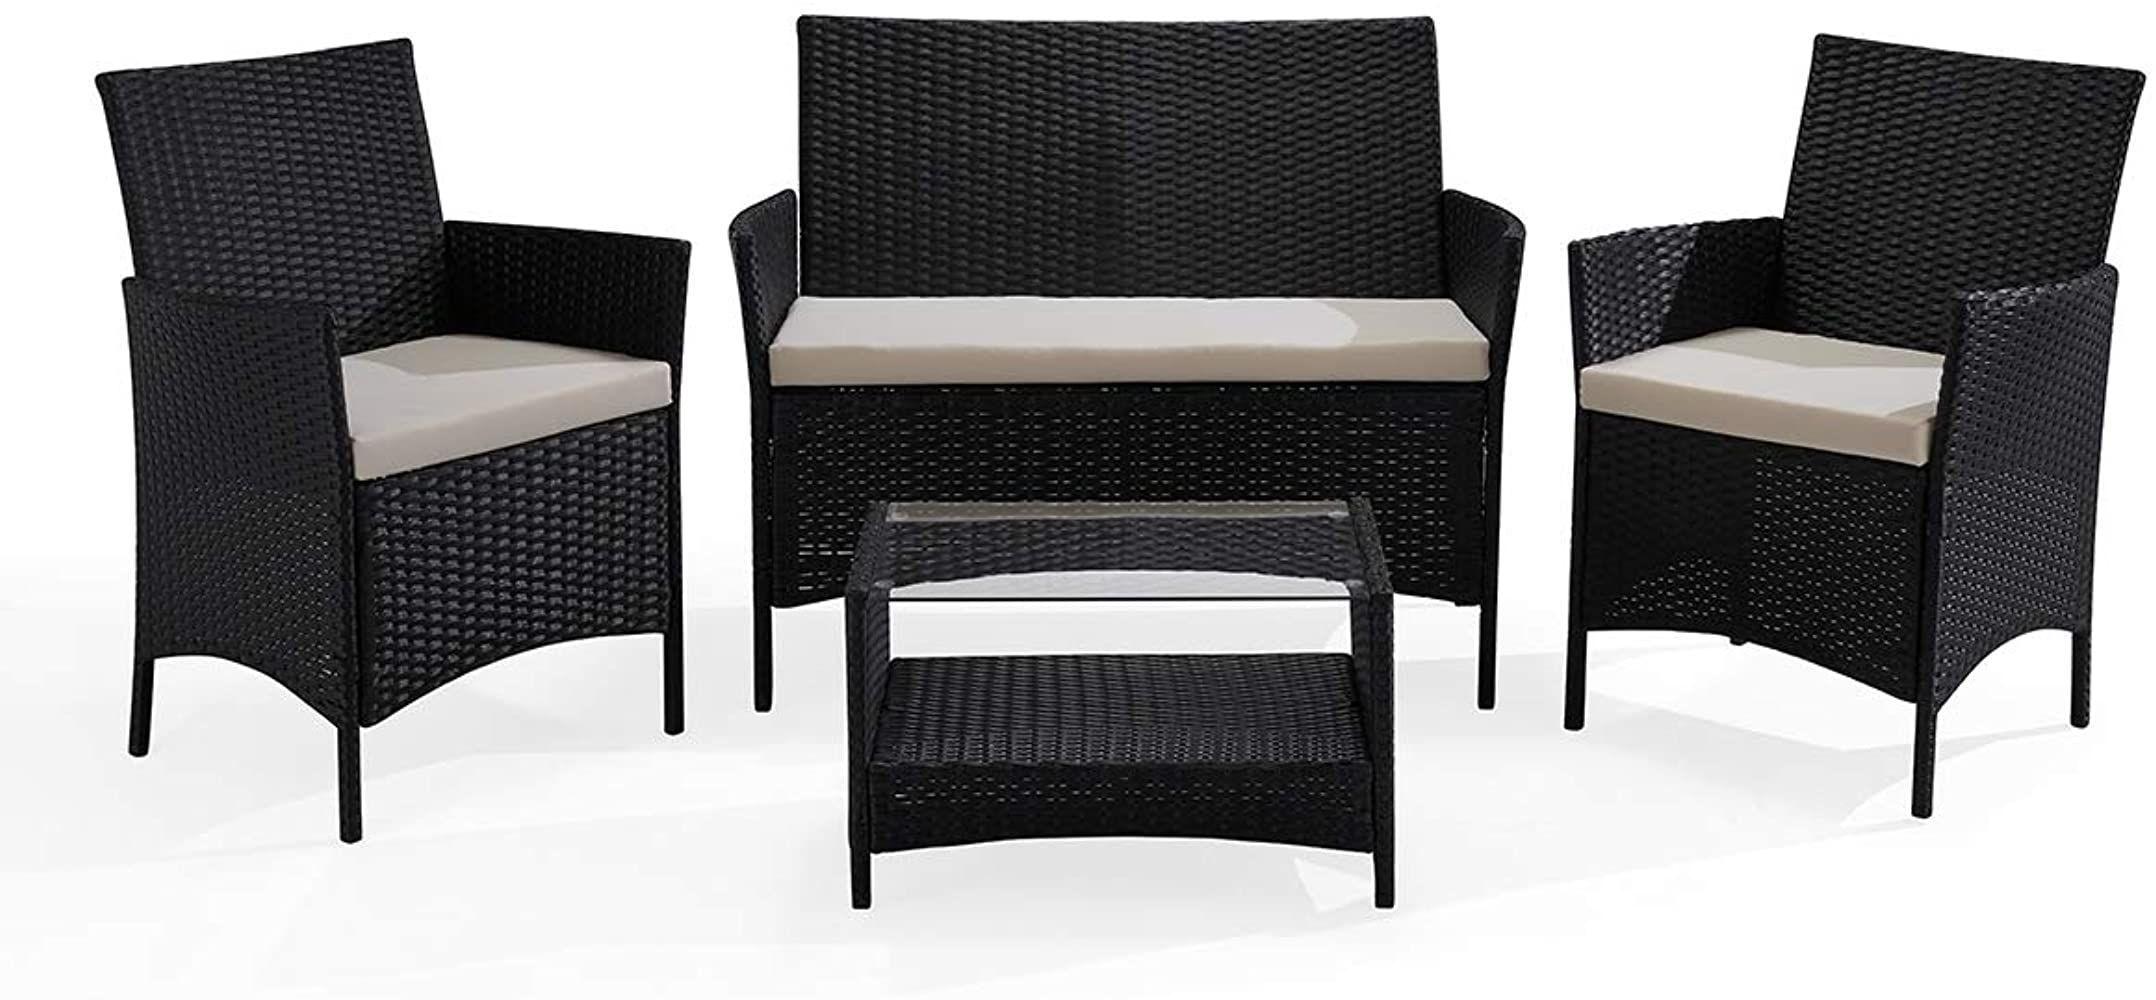 Poly Rattan Garnitur Sitzgruppe Gartenmöbel Sitzgarnitur Essgruppe Lounge Balkon